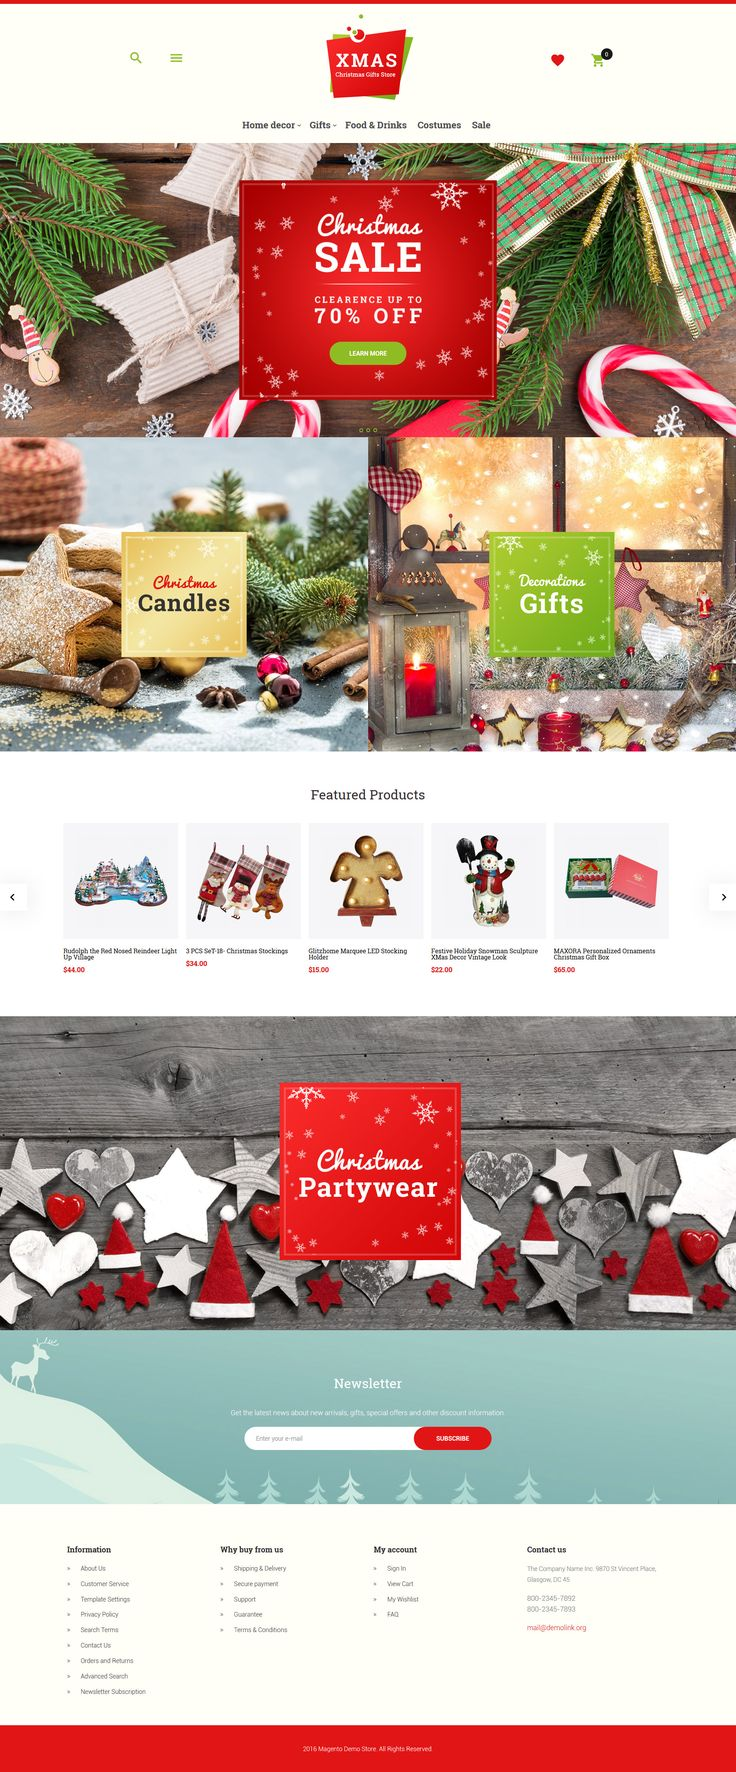 Christmas Responsive Magento Theme - https://www.templatemonster.com/magento-themes/christmas-responsive-magento-theme-62086.html